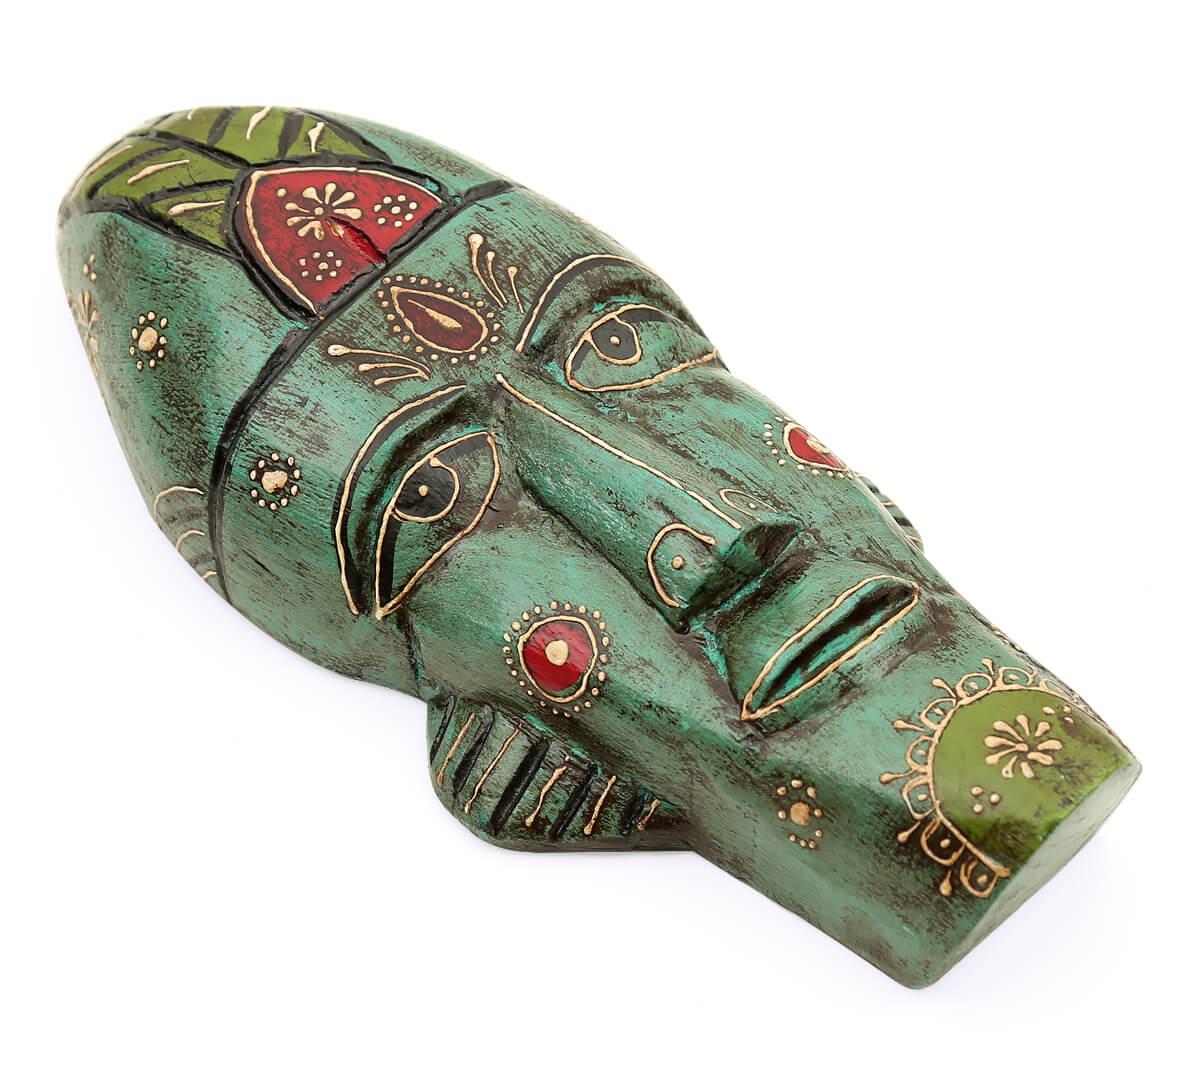 Teal Leprechaun Decorative Wooden Mask